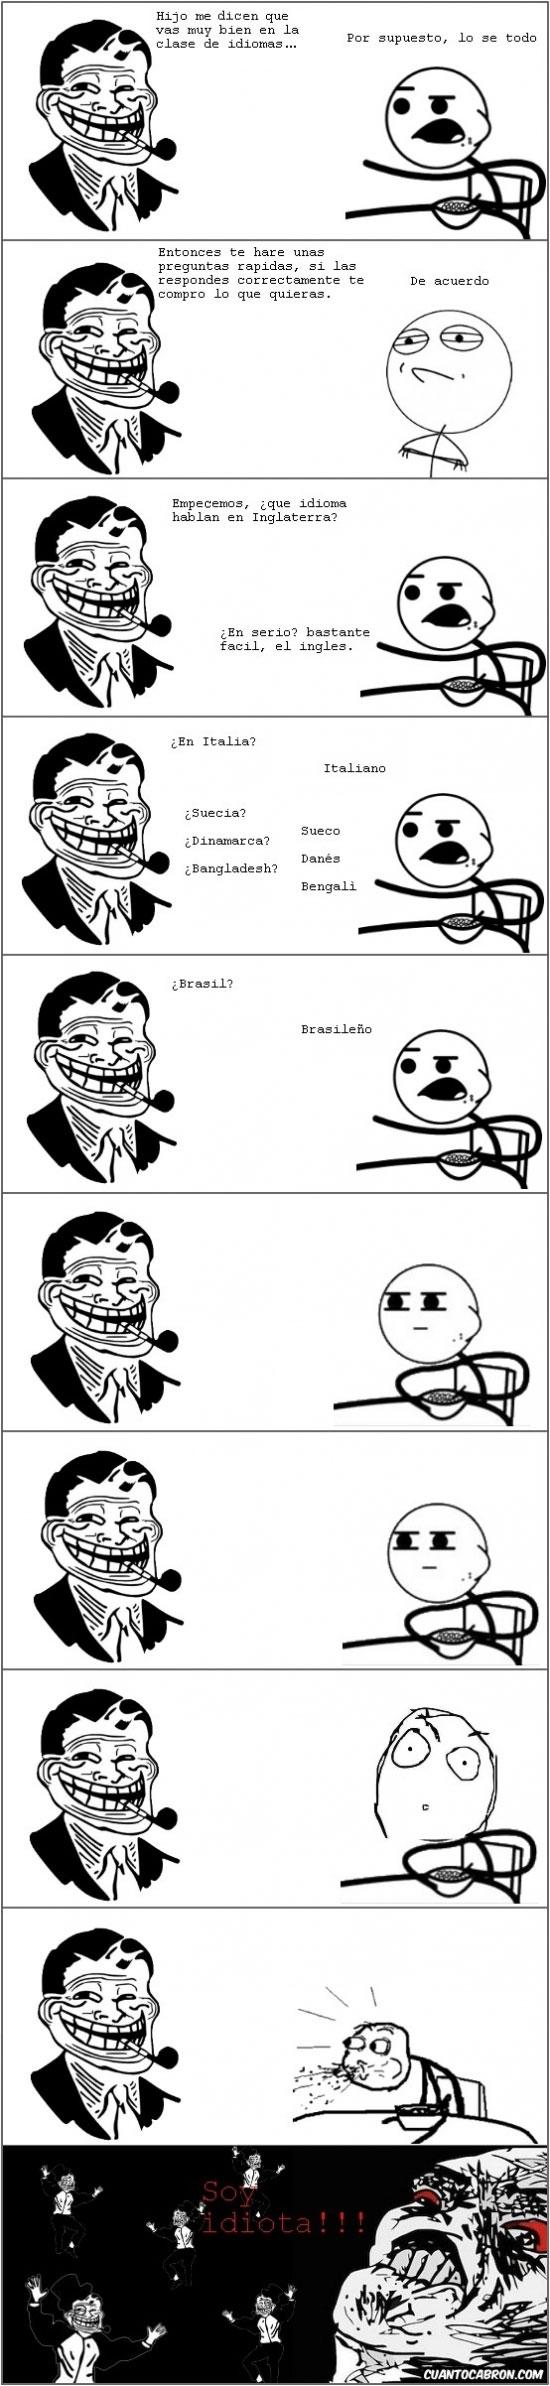 Trolldad - Nadie sabe confundirte mejor que Trolldad